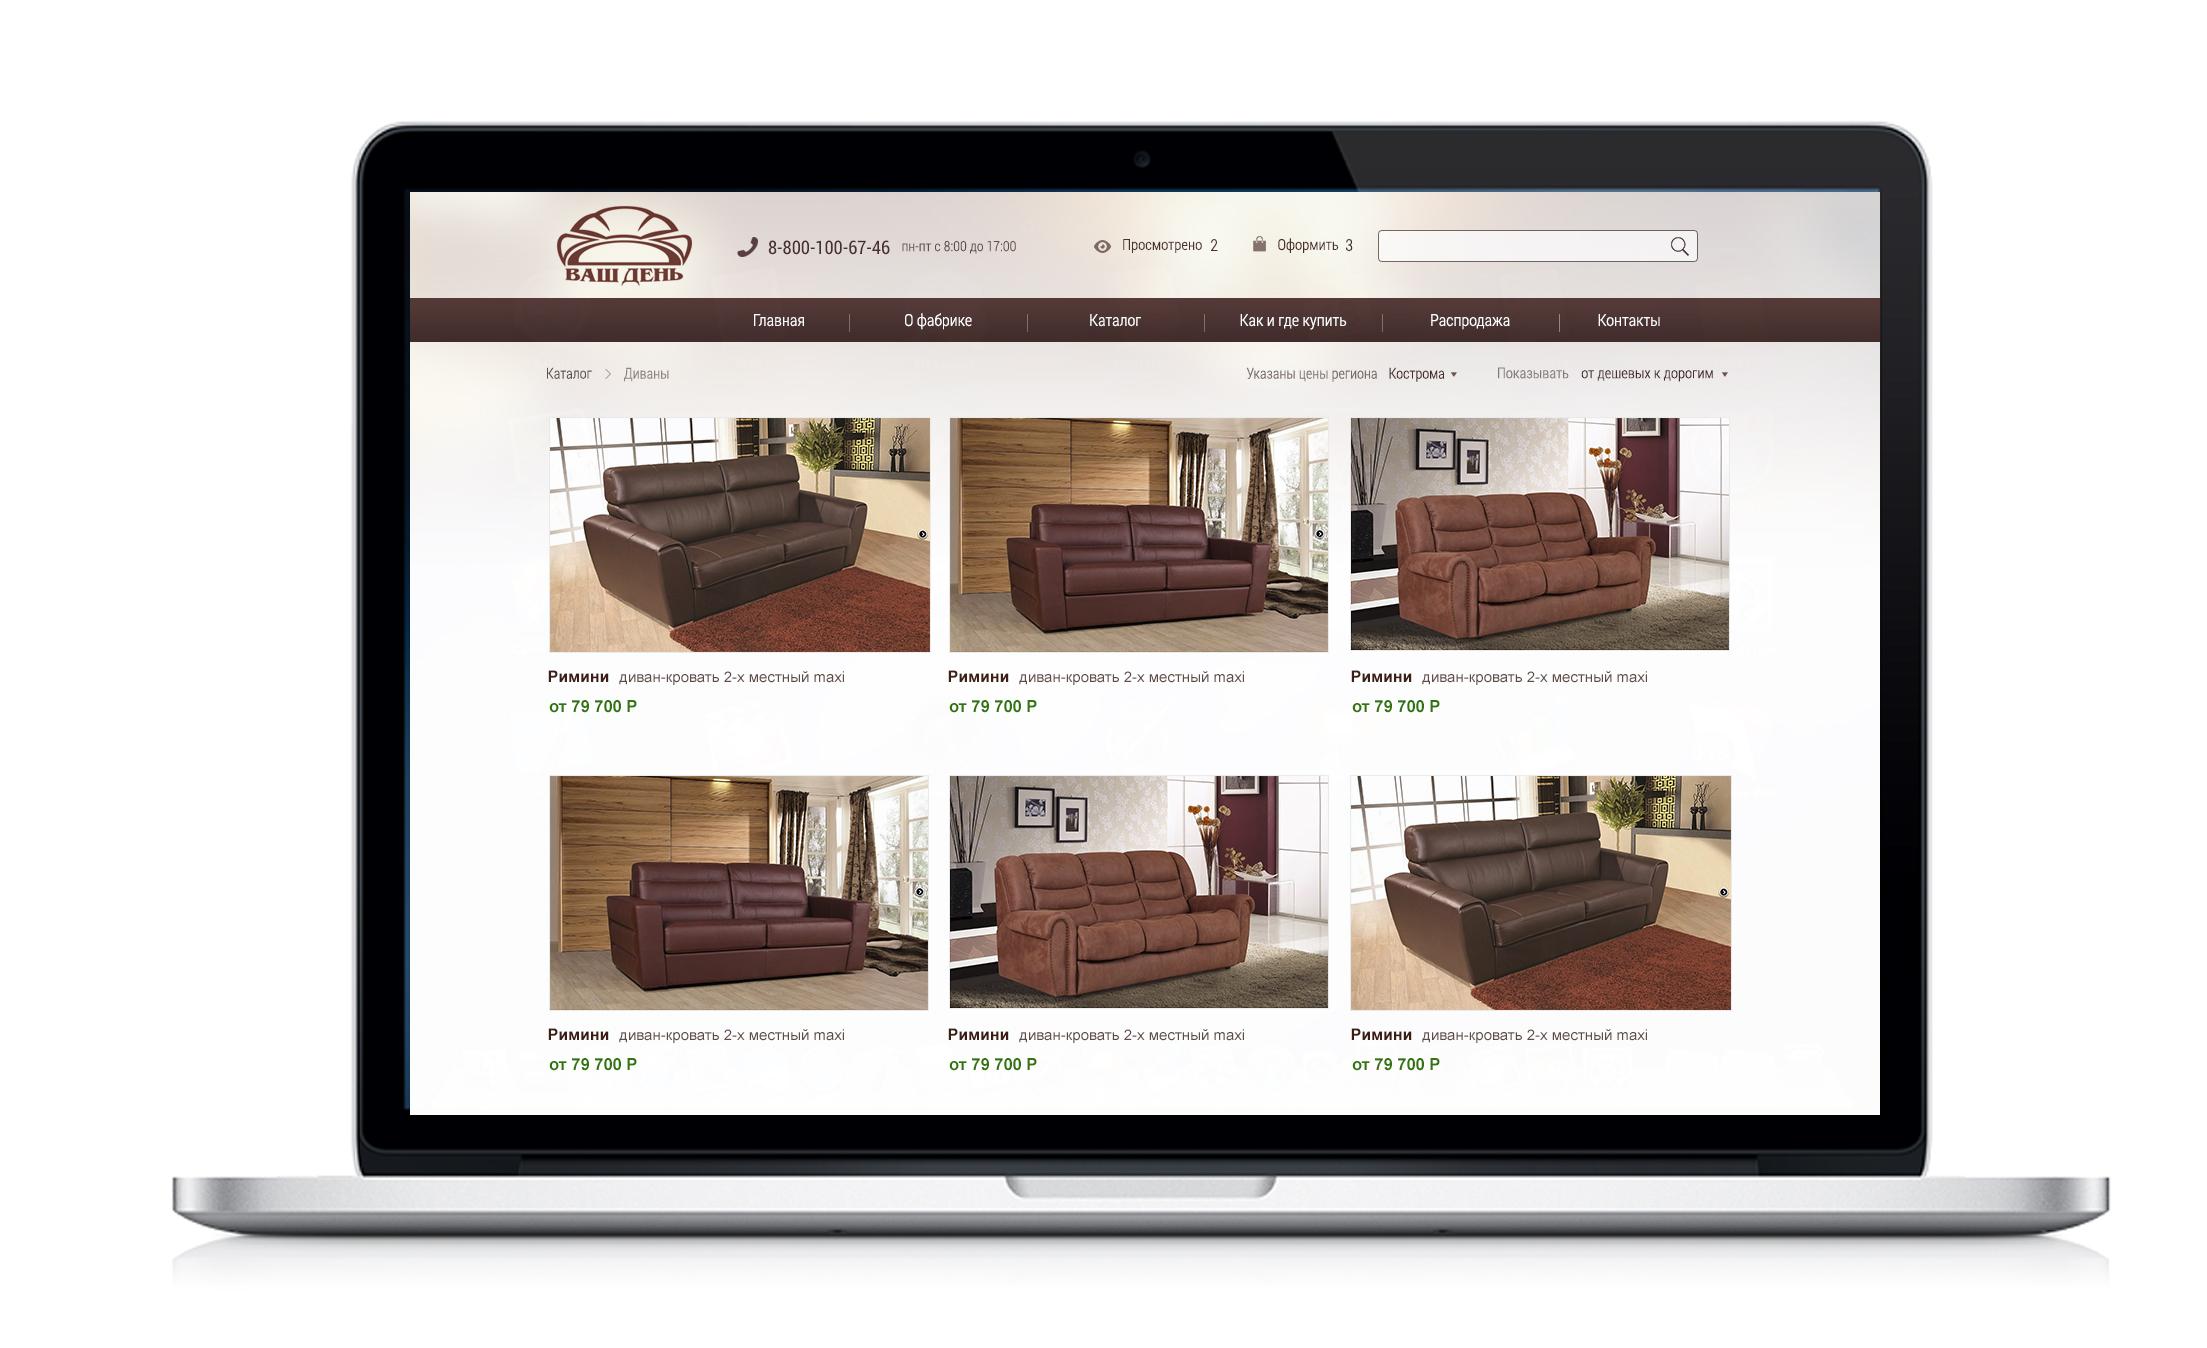 Разработать дизайн для интернет-магазина мебели фото f_25952e67cc5524d8.jpg